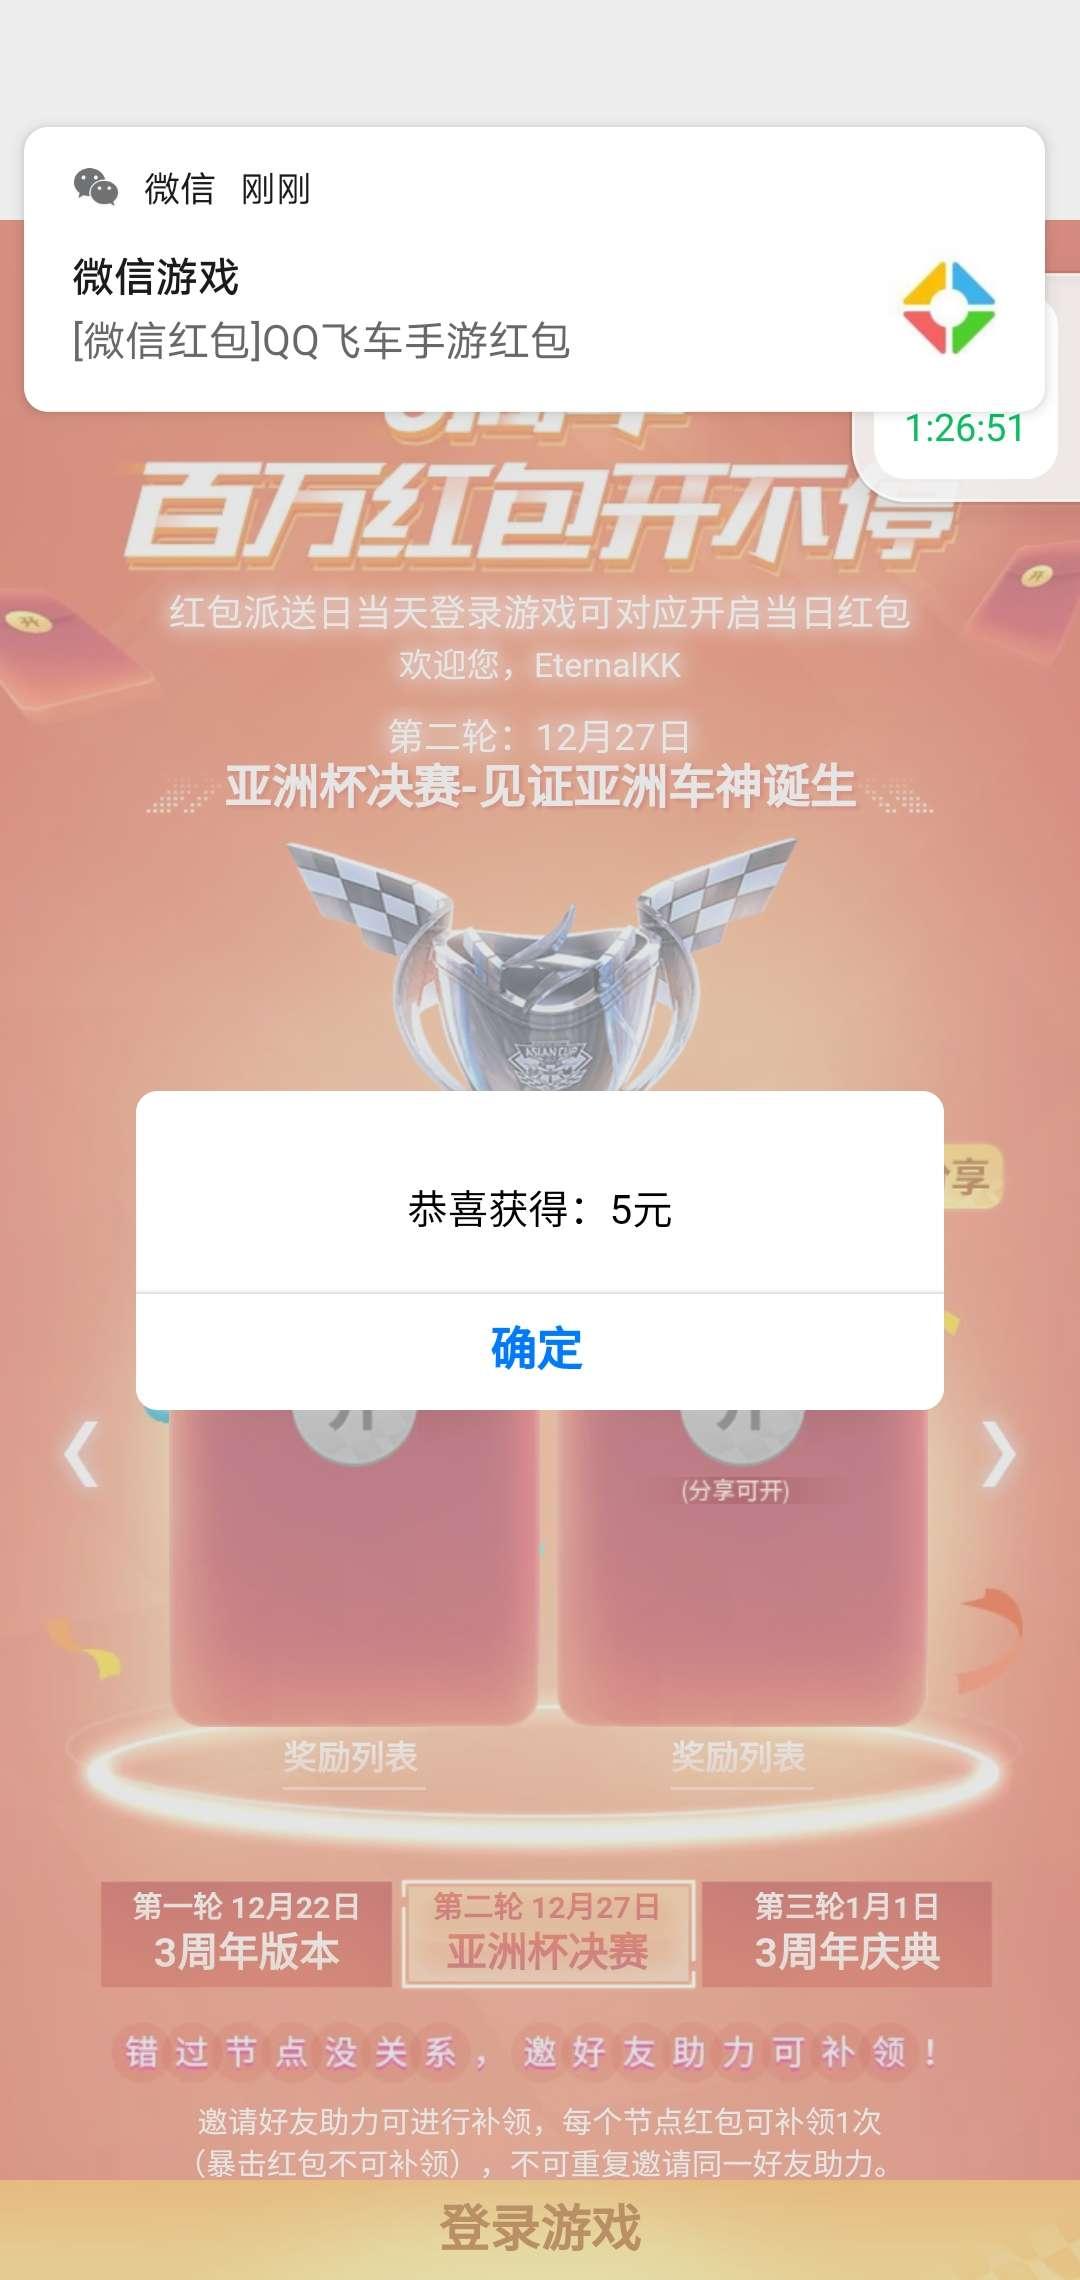 QQ飞车登陆和分享免费2-88Q币插图2